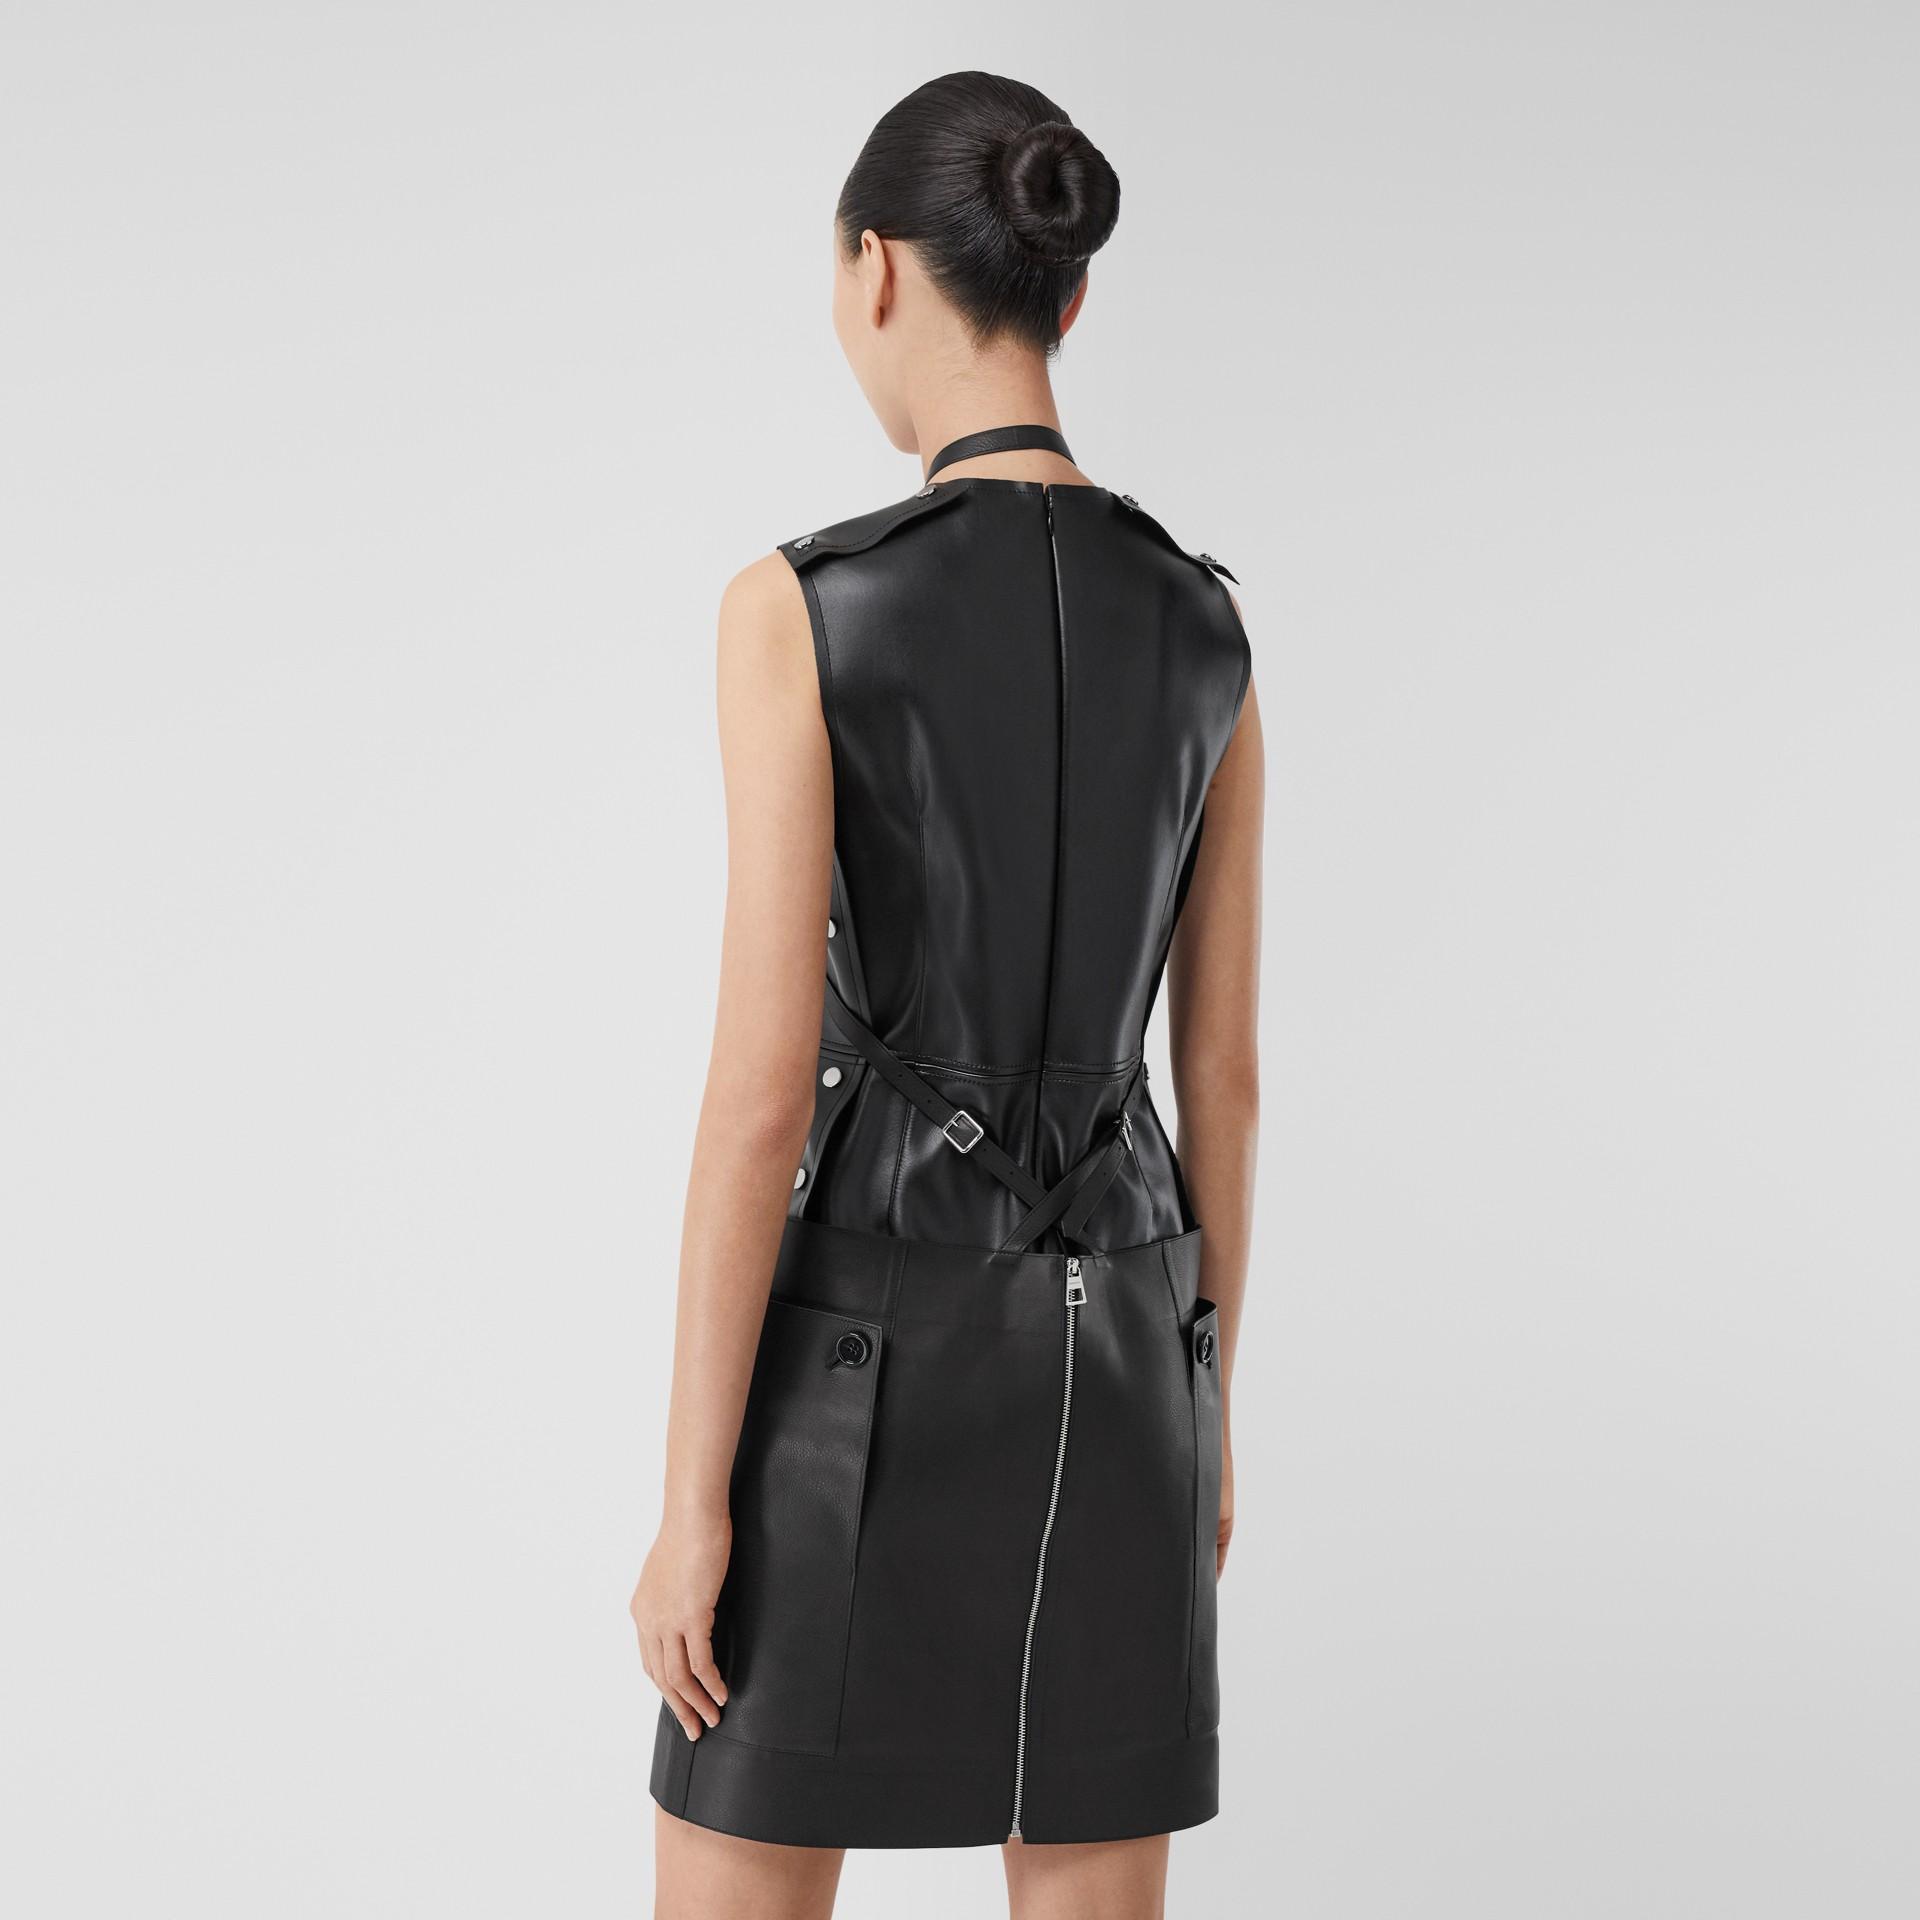 Eyelet Detail Leather Sleeveless Dress in Black - Women | Burberry - gallery image 2